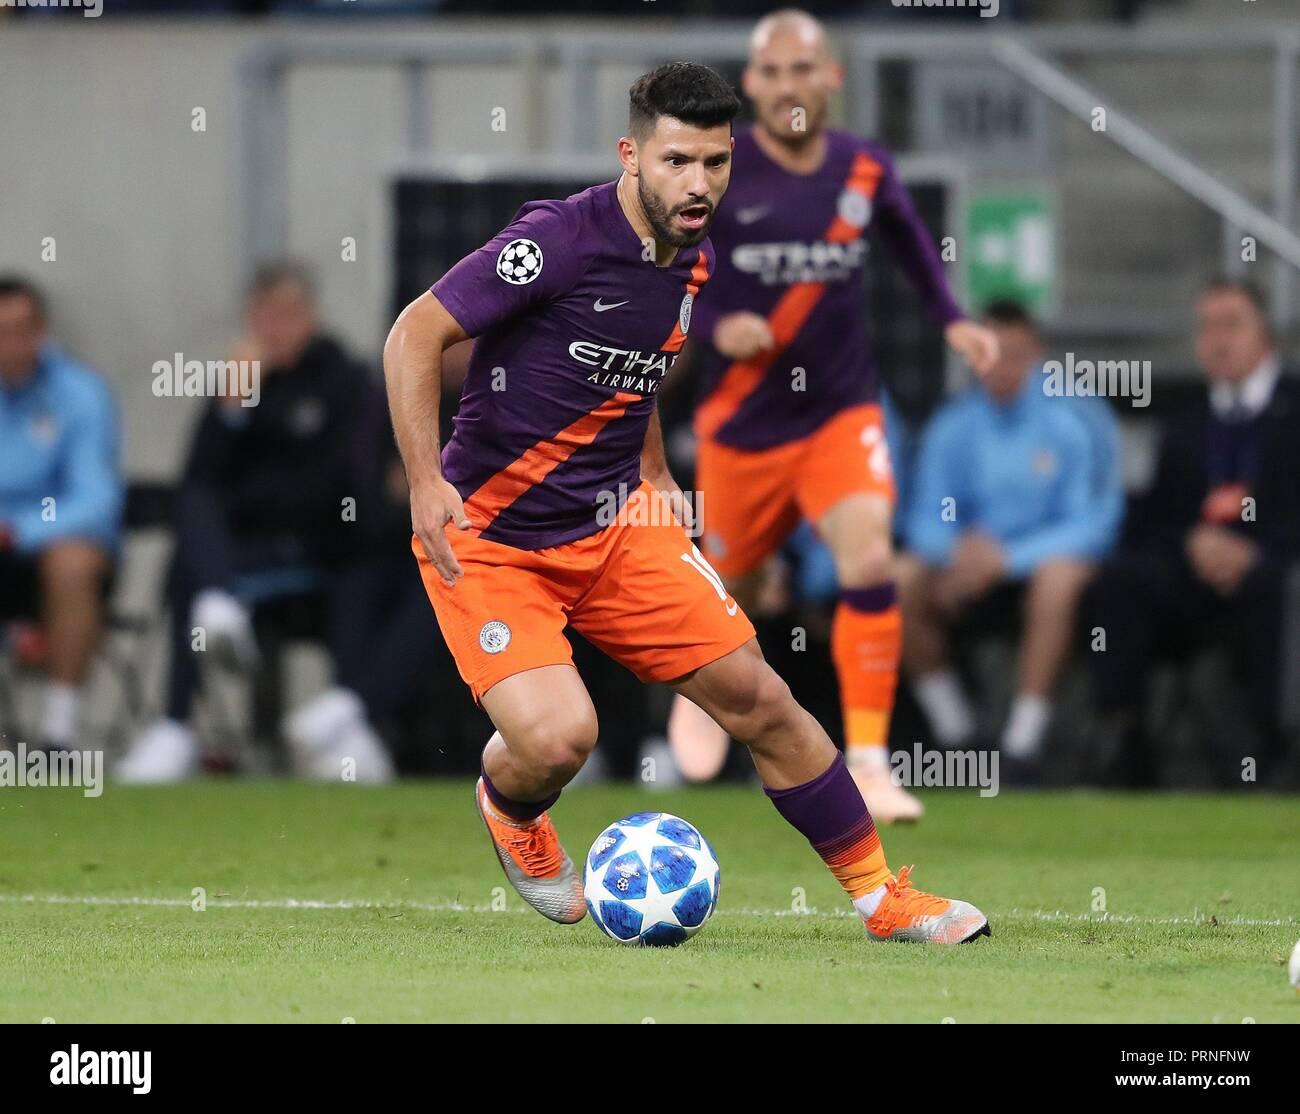 firo: 02.10.2018 Football, Football, Champions League: TSG Hoffenheim - Manchester City 1: 2 single action, Kun Aguero   usage worldwide - Stock Image